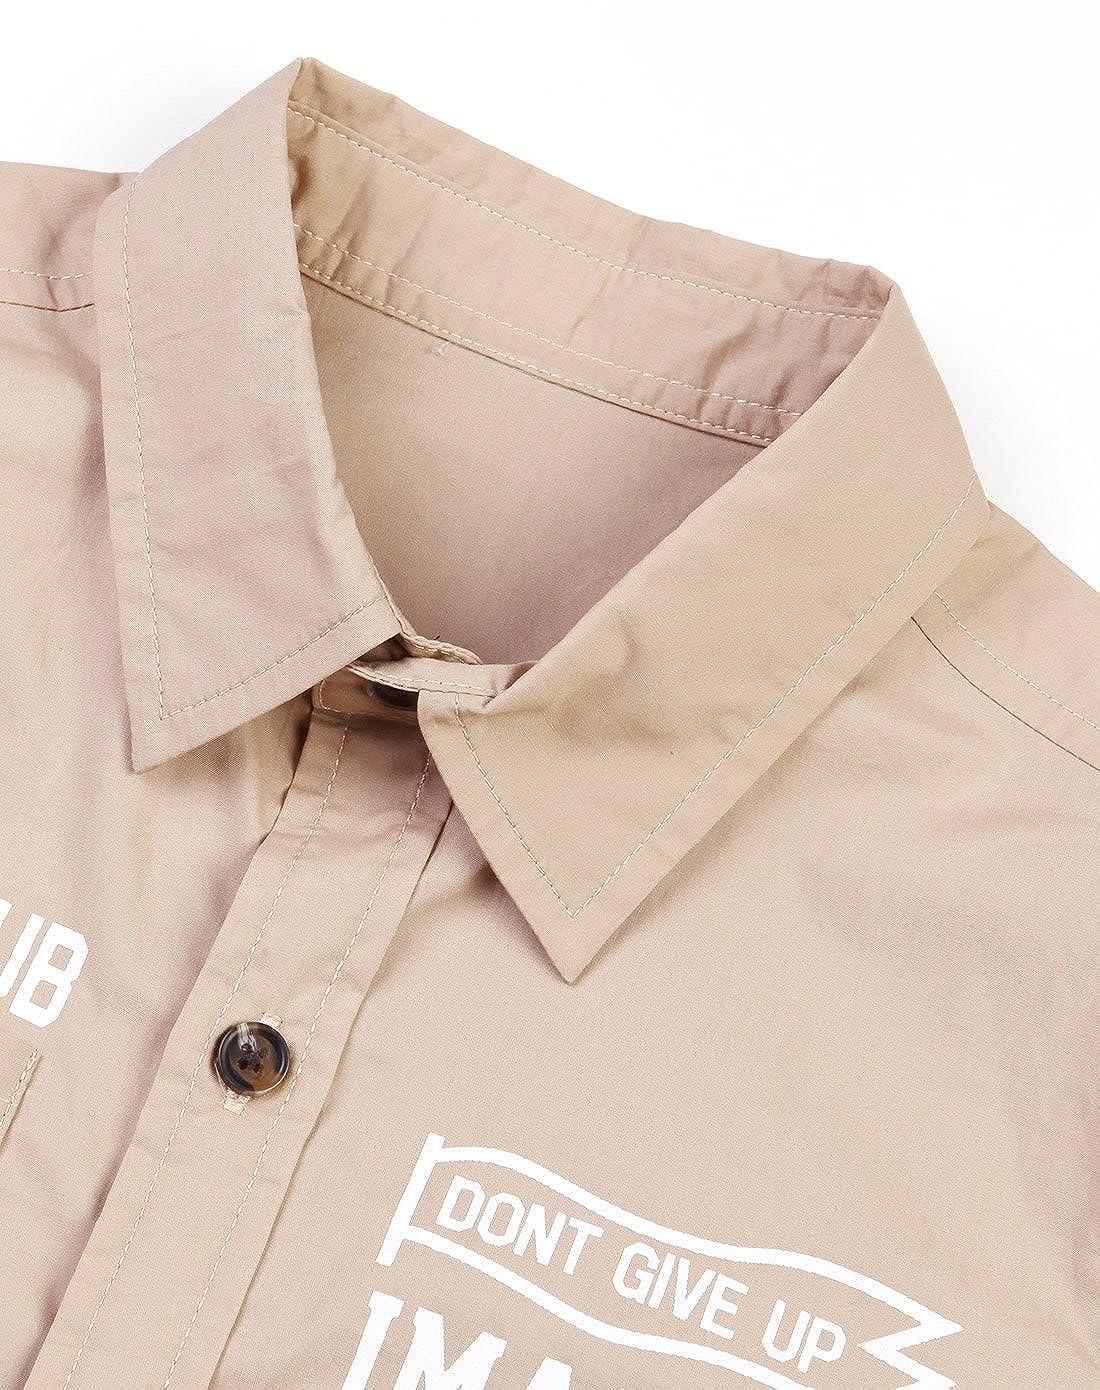 Boys Short Sleeve Poplin Dress Shirt Fashion Uniform Oxford Shirt